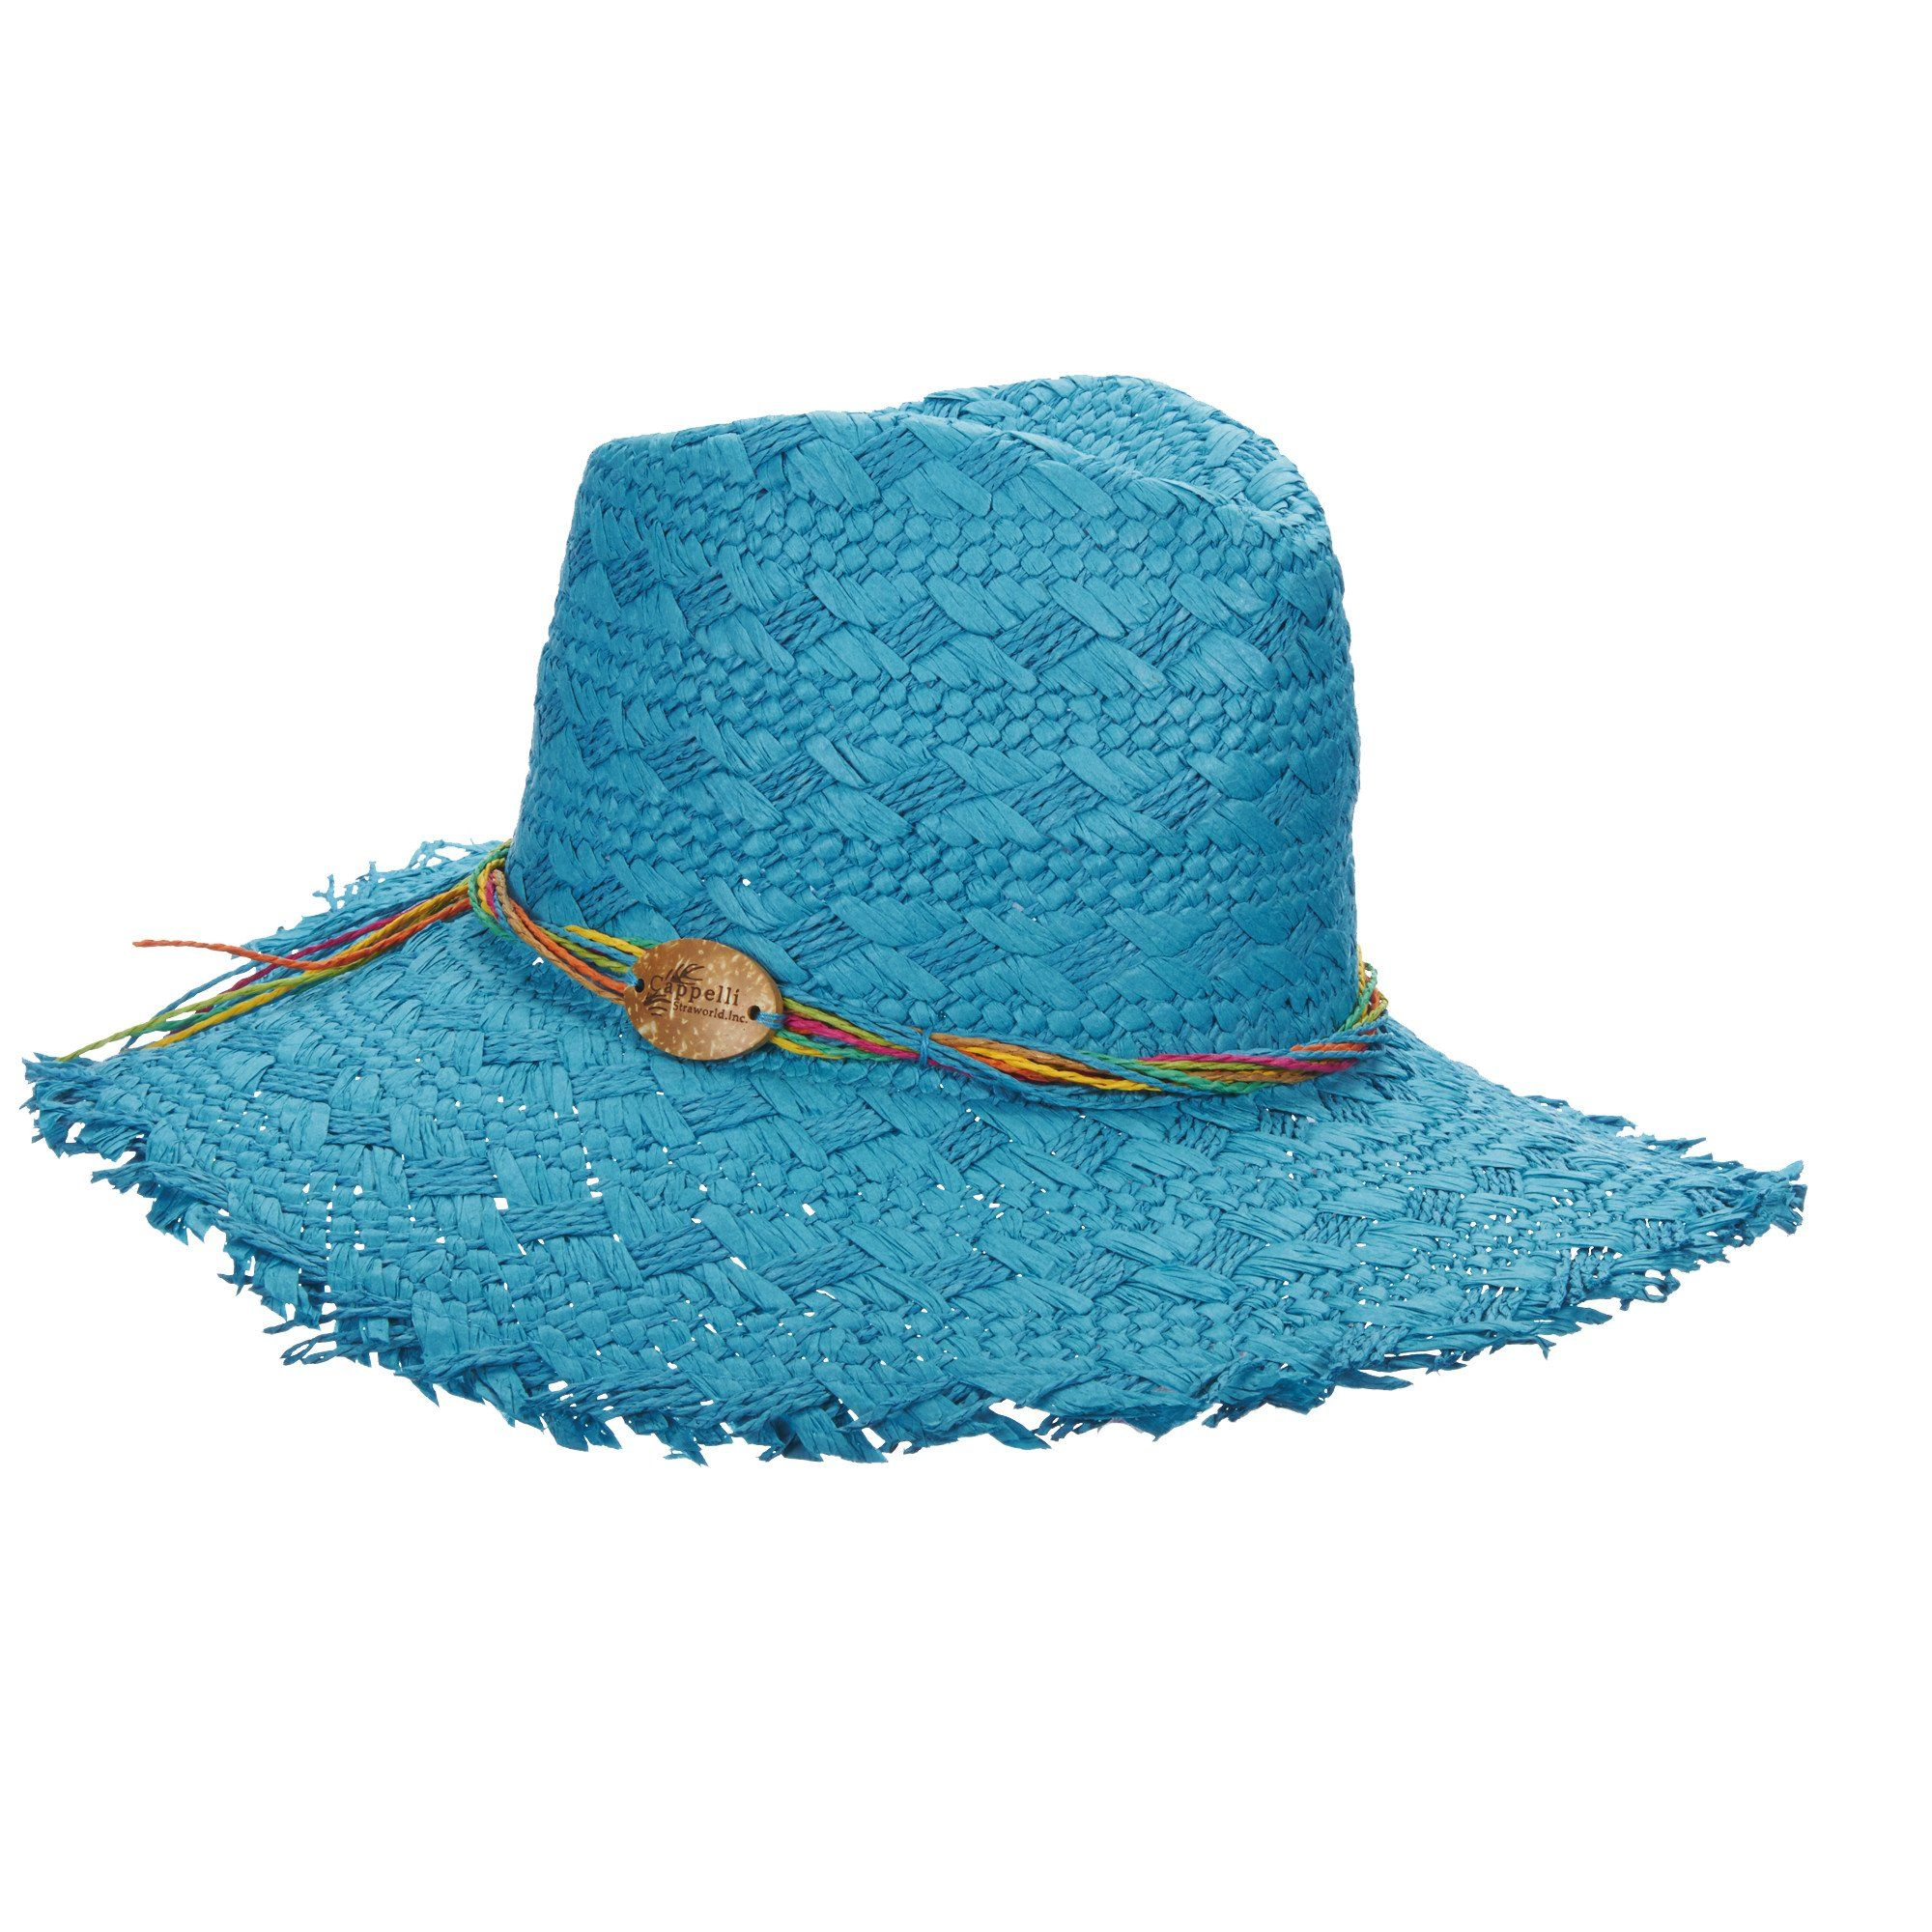 f923e002 Woven toyo safari style hat with floppy brim. Twisted multicolor tie  accent. Coconut CAPPELLI logo detail. Unfinished edge, 4